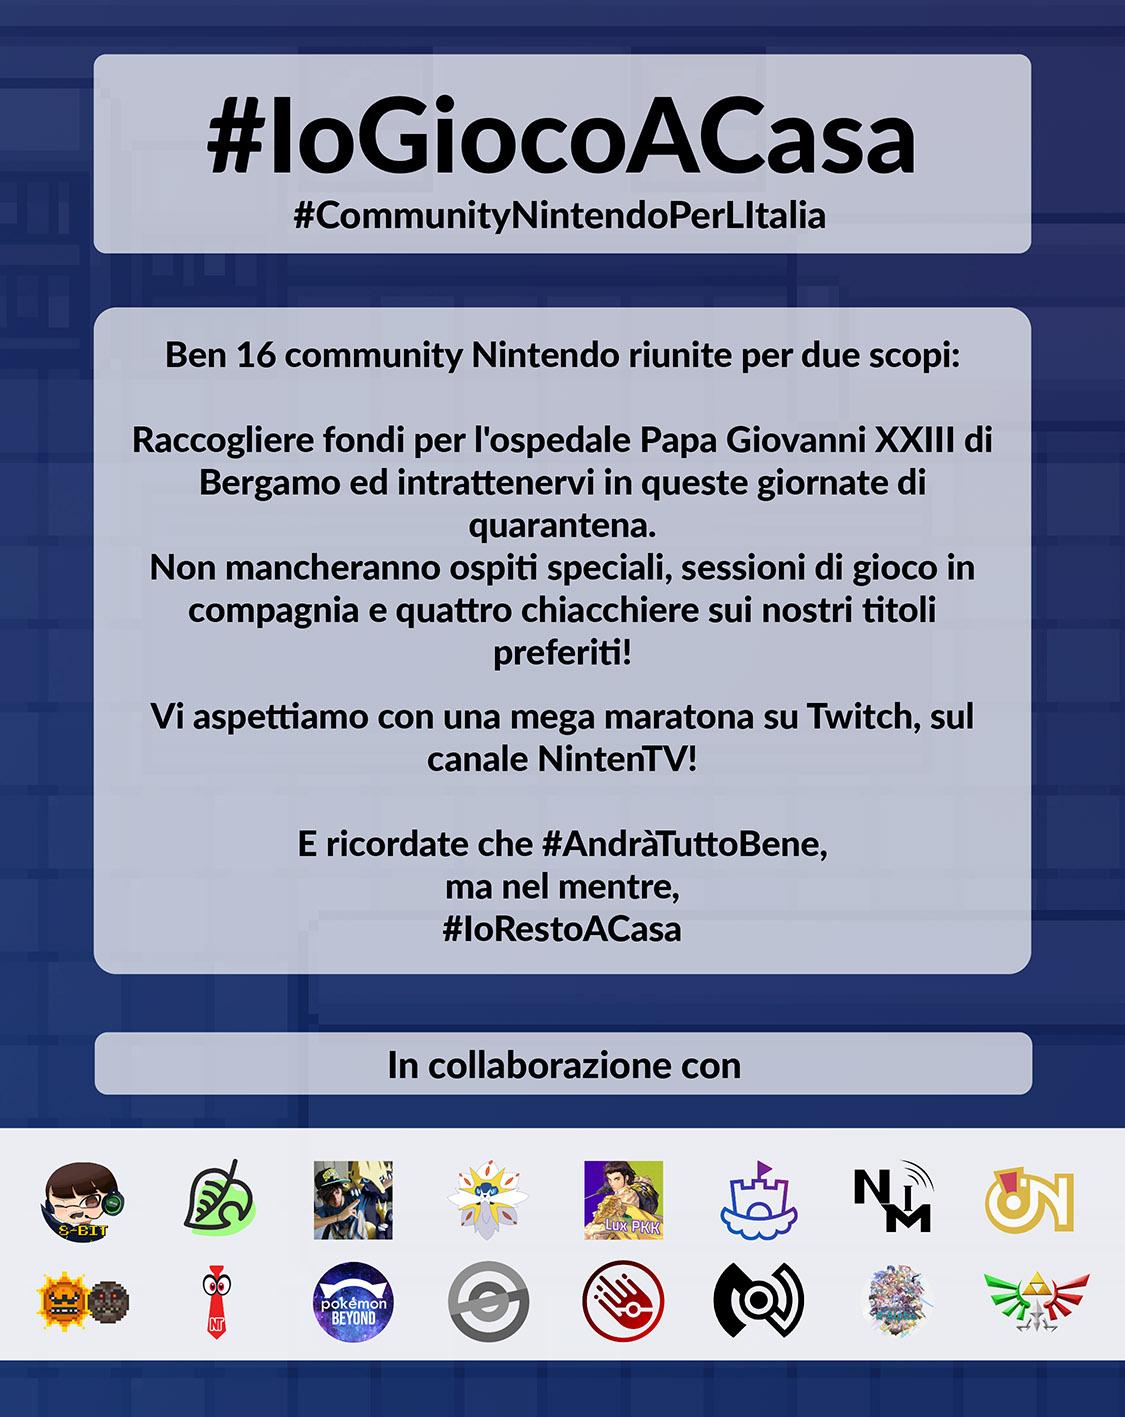 #CommunityNintendoPerLItalia locandina